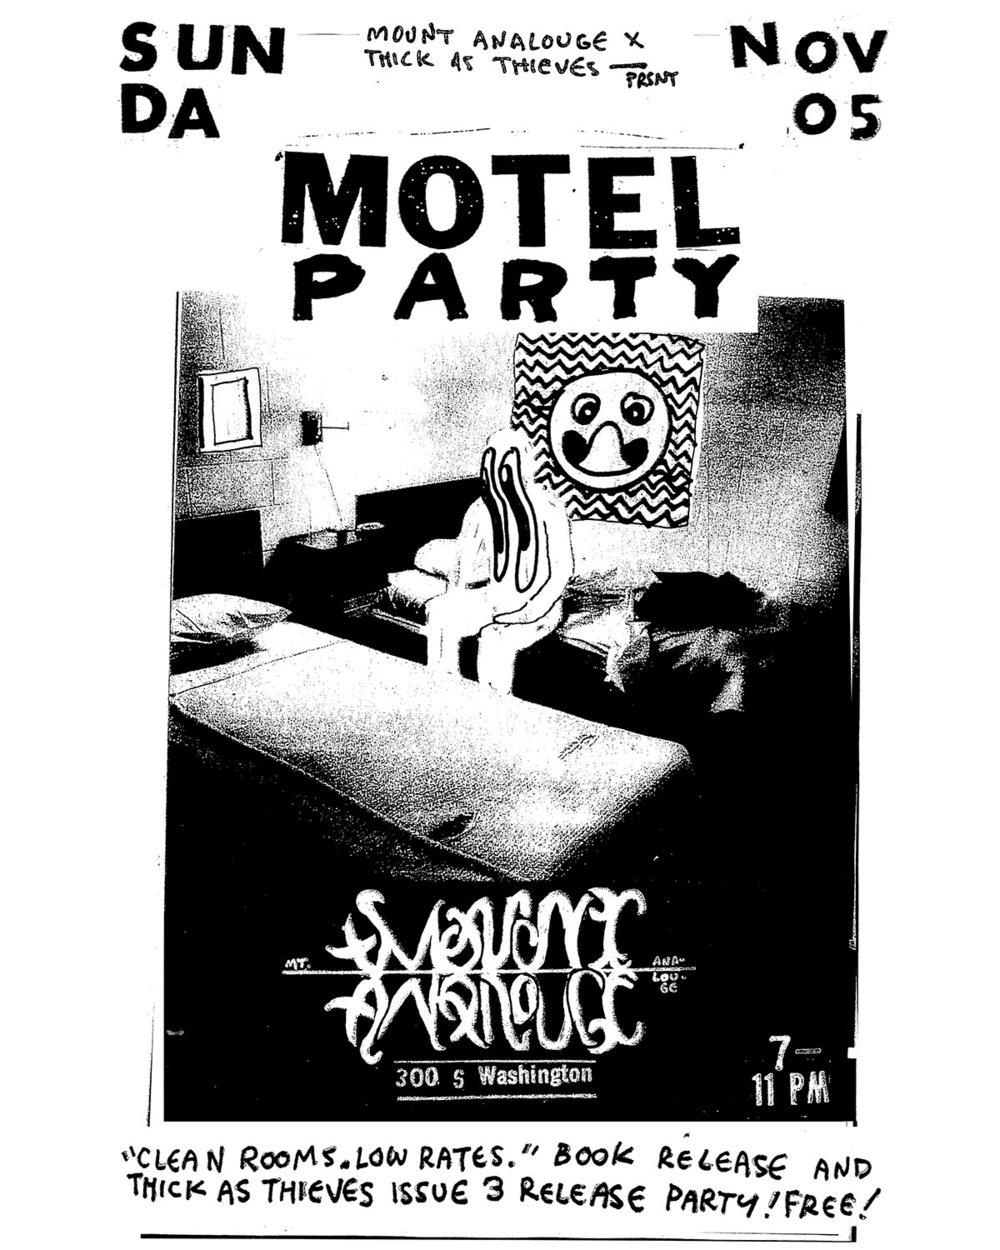 motelparty_postercopy.jpg